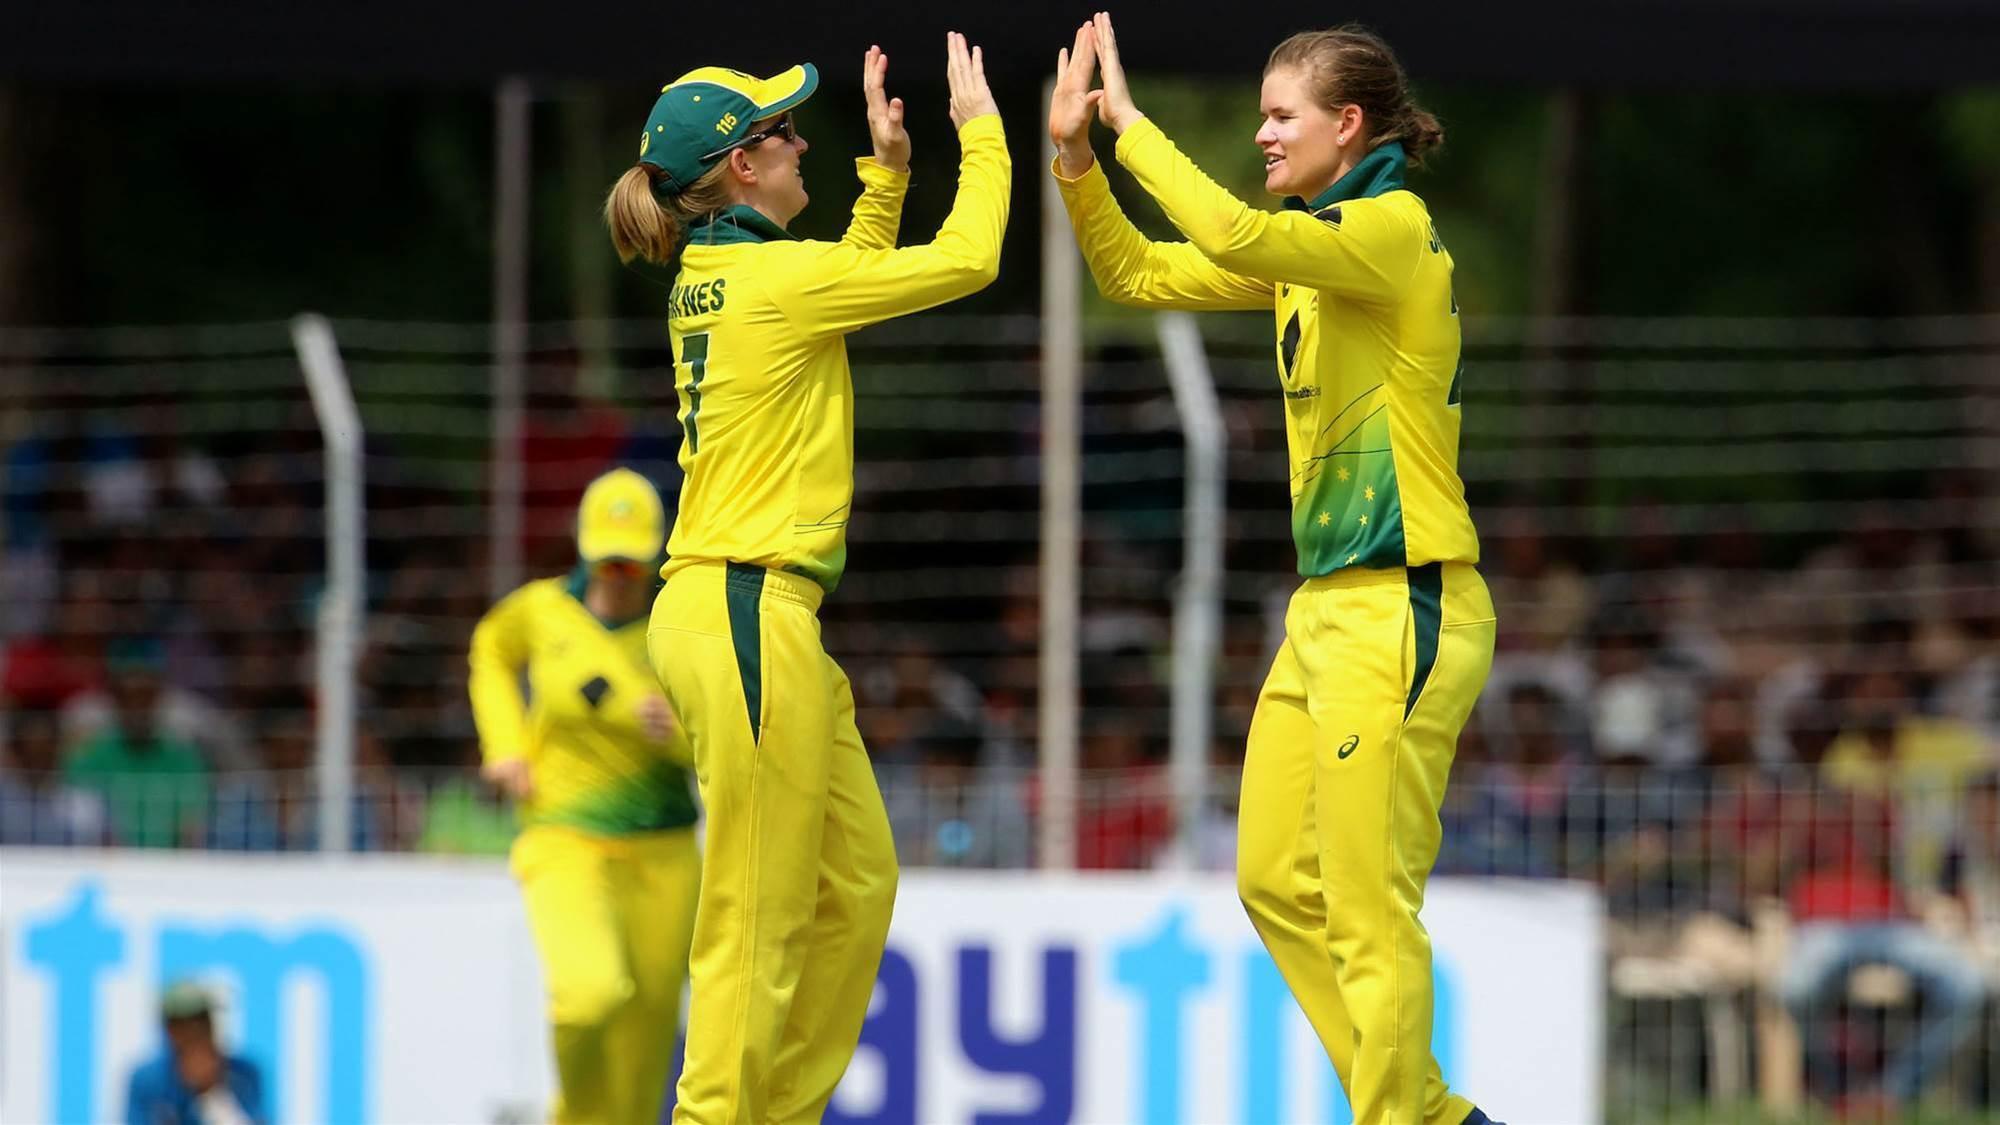 Jess Jonassen: Australia to take form into T20 formate